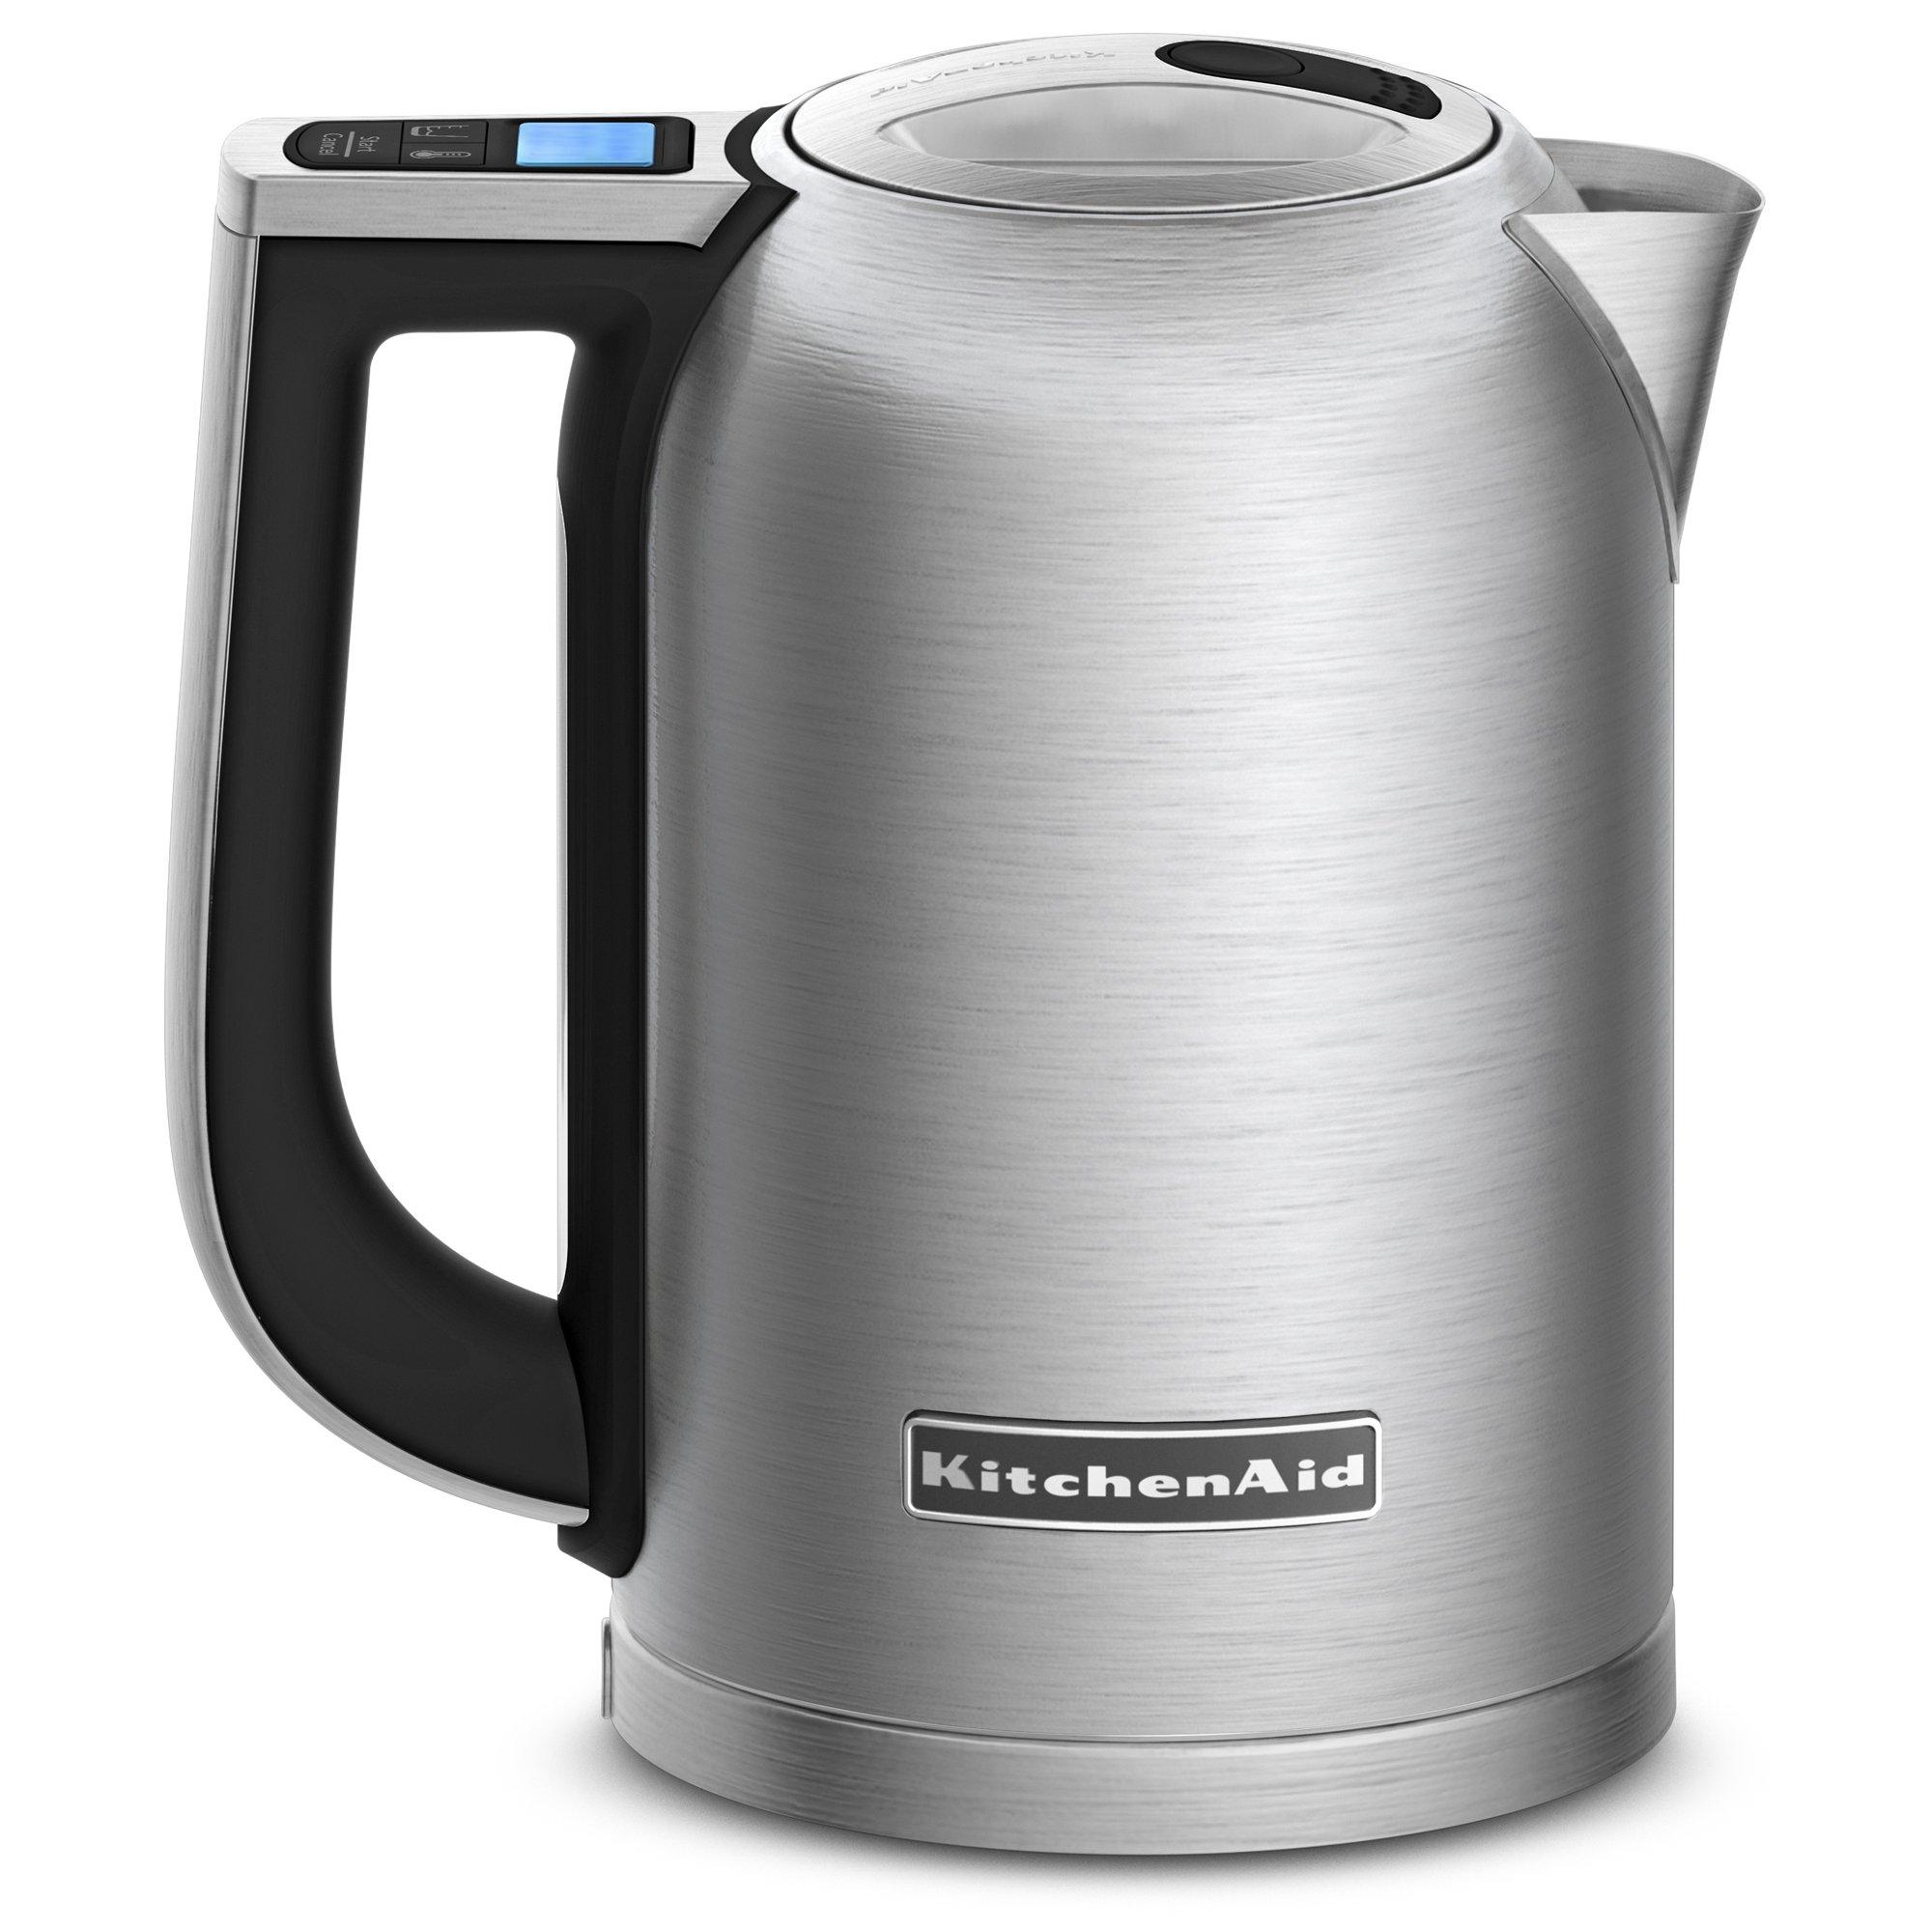 Kitchenaid Electric Kettle ~ Kitchenaid kek sx liter electric kettle with led